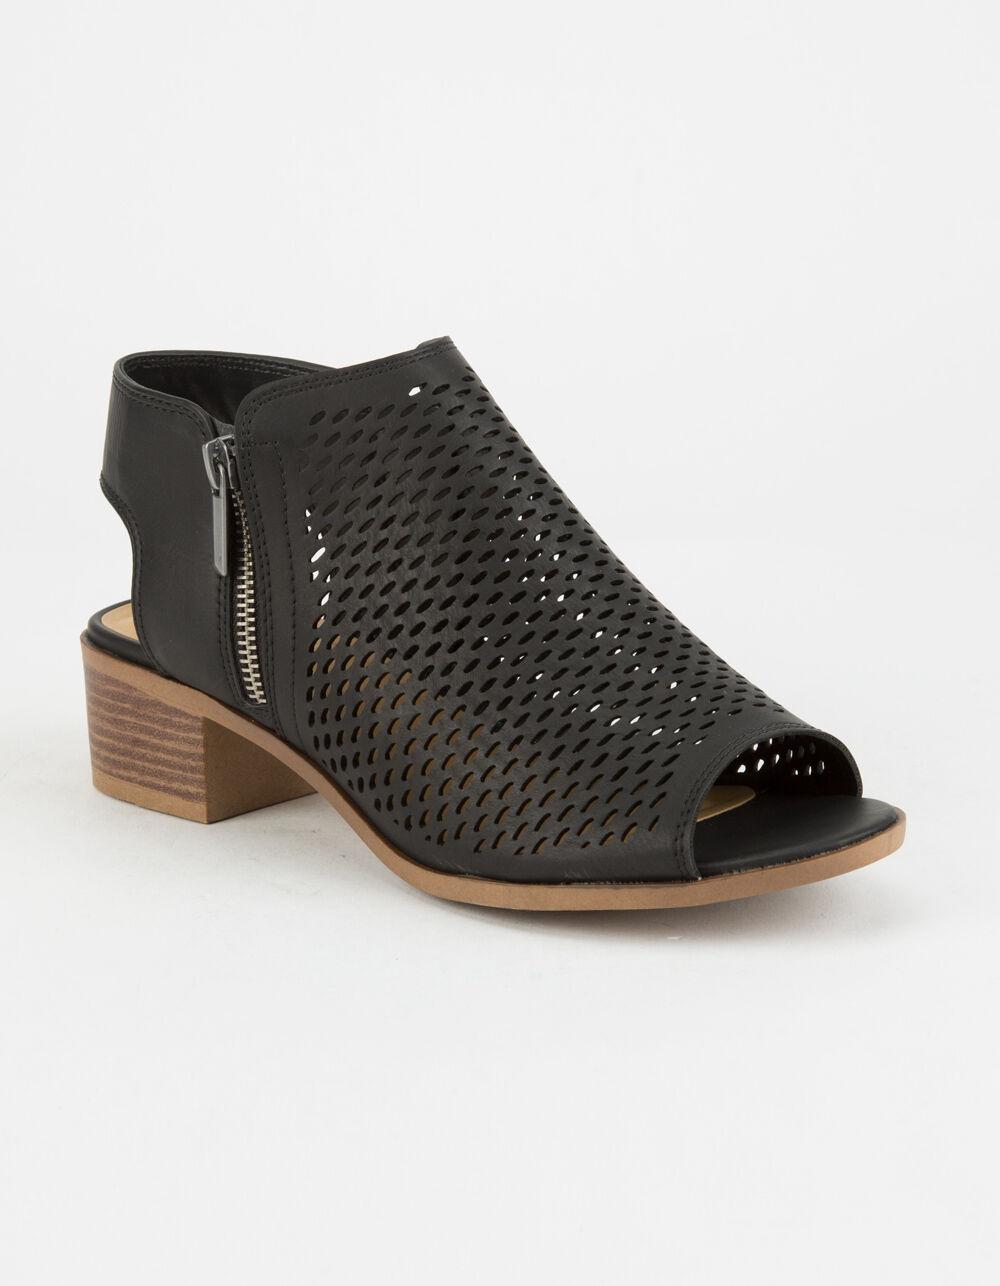 SODA Perforated Block Heel Black Booties